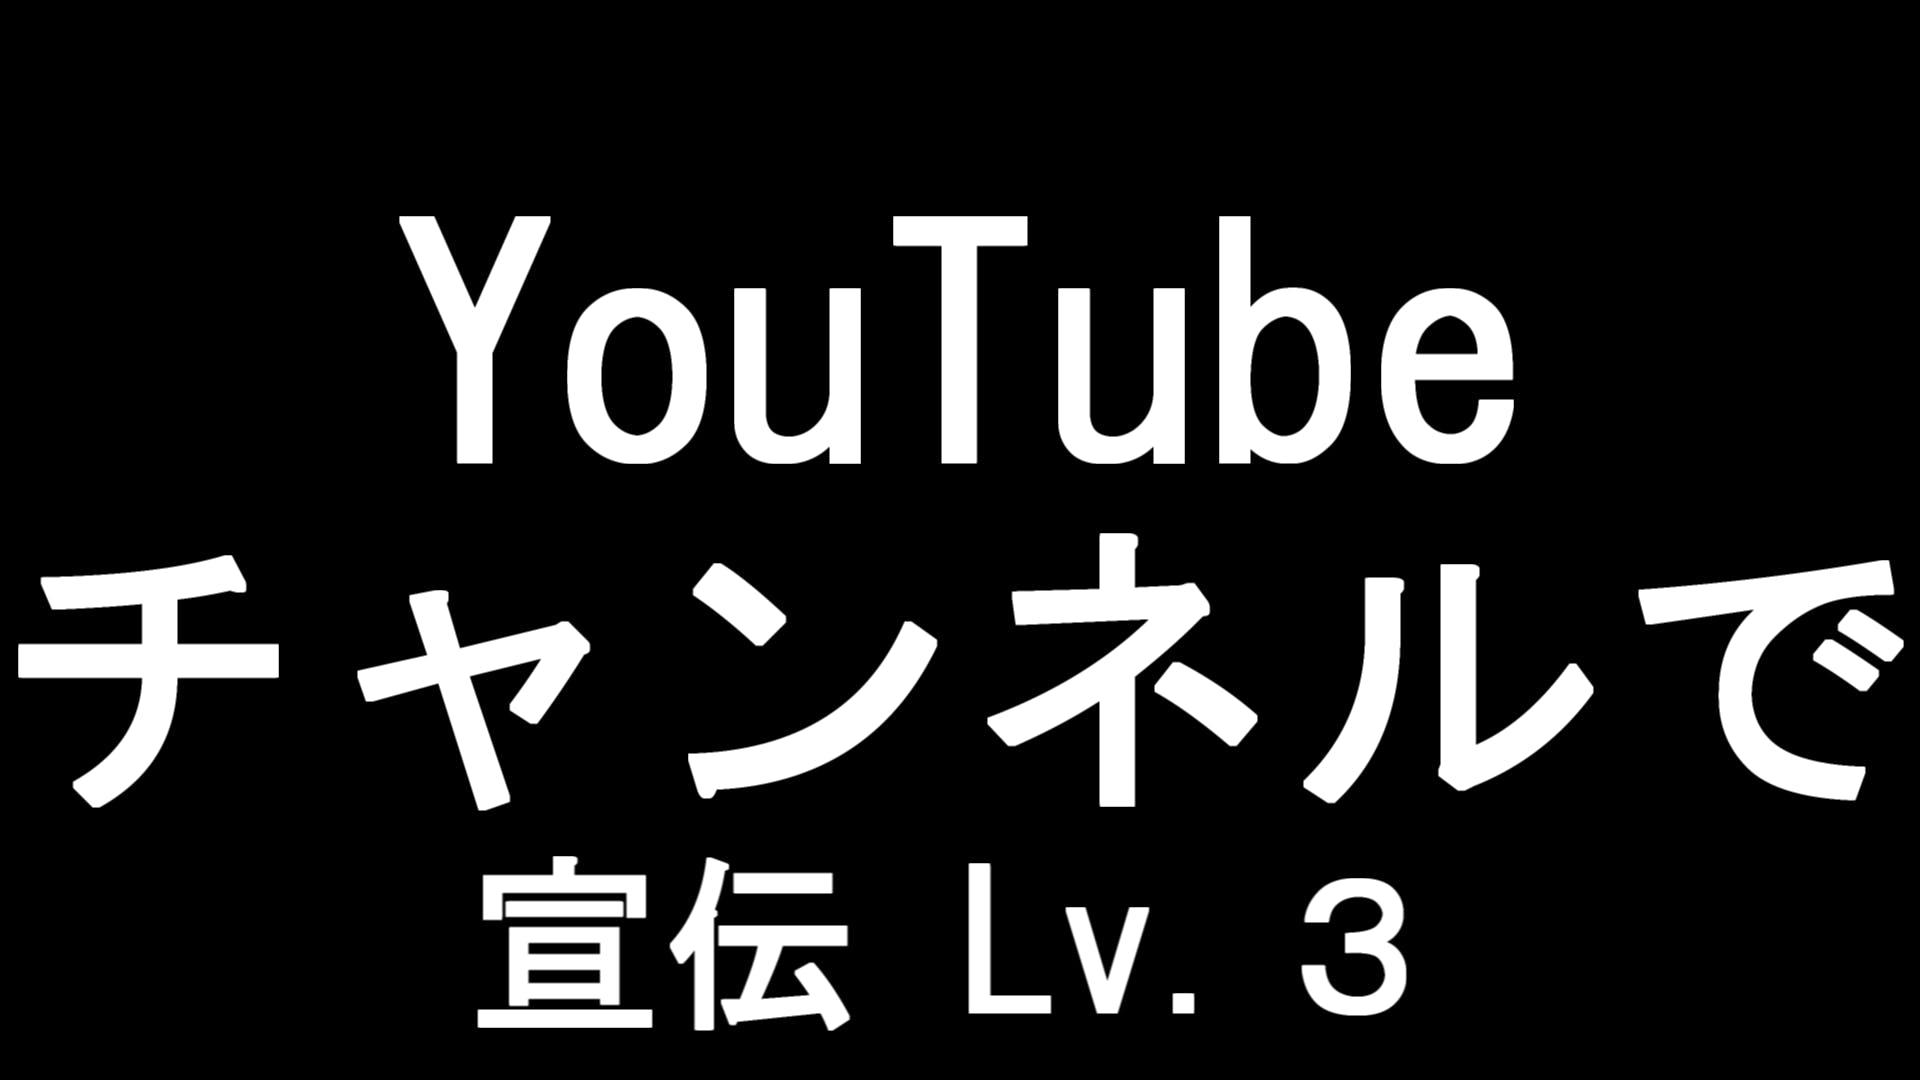 Youtubeチャンネルで宣伝レベル3